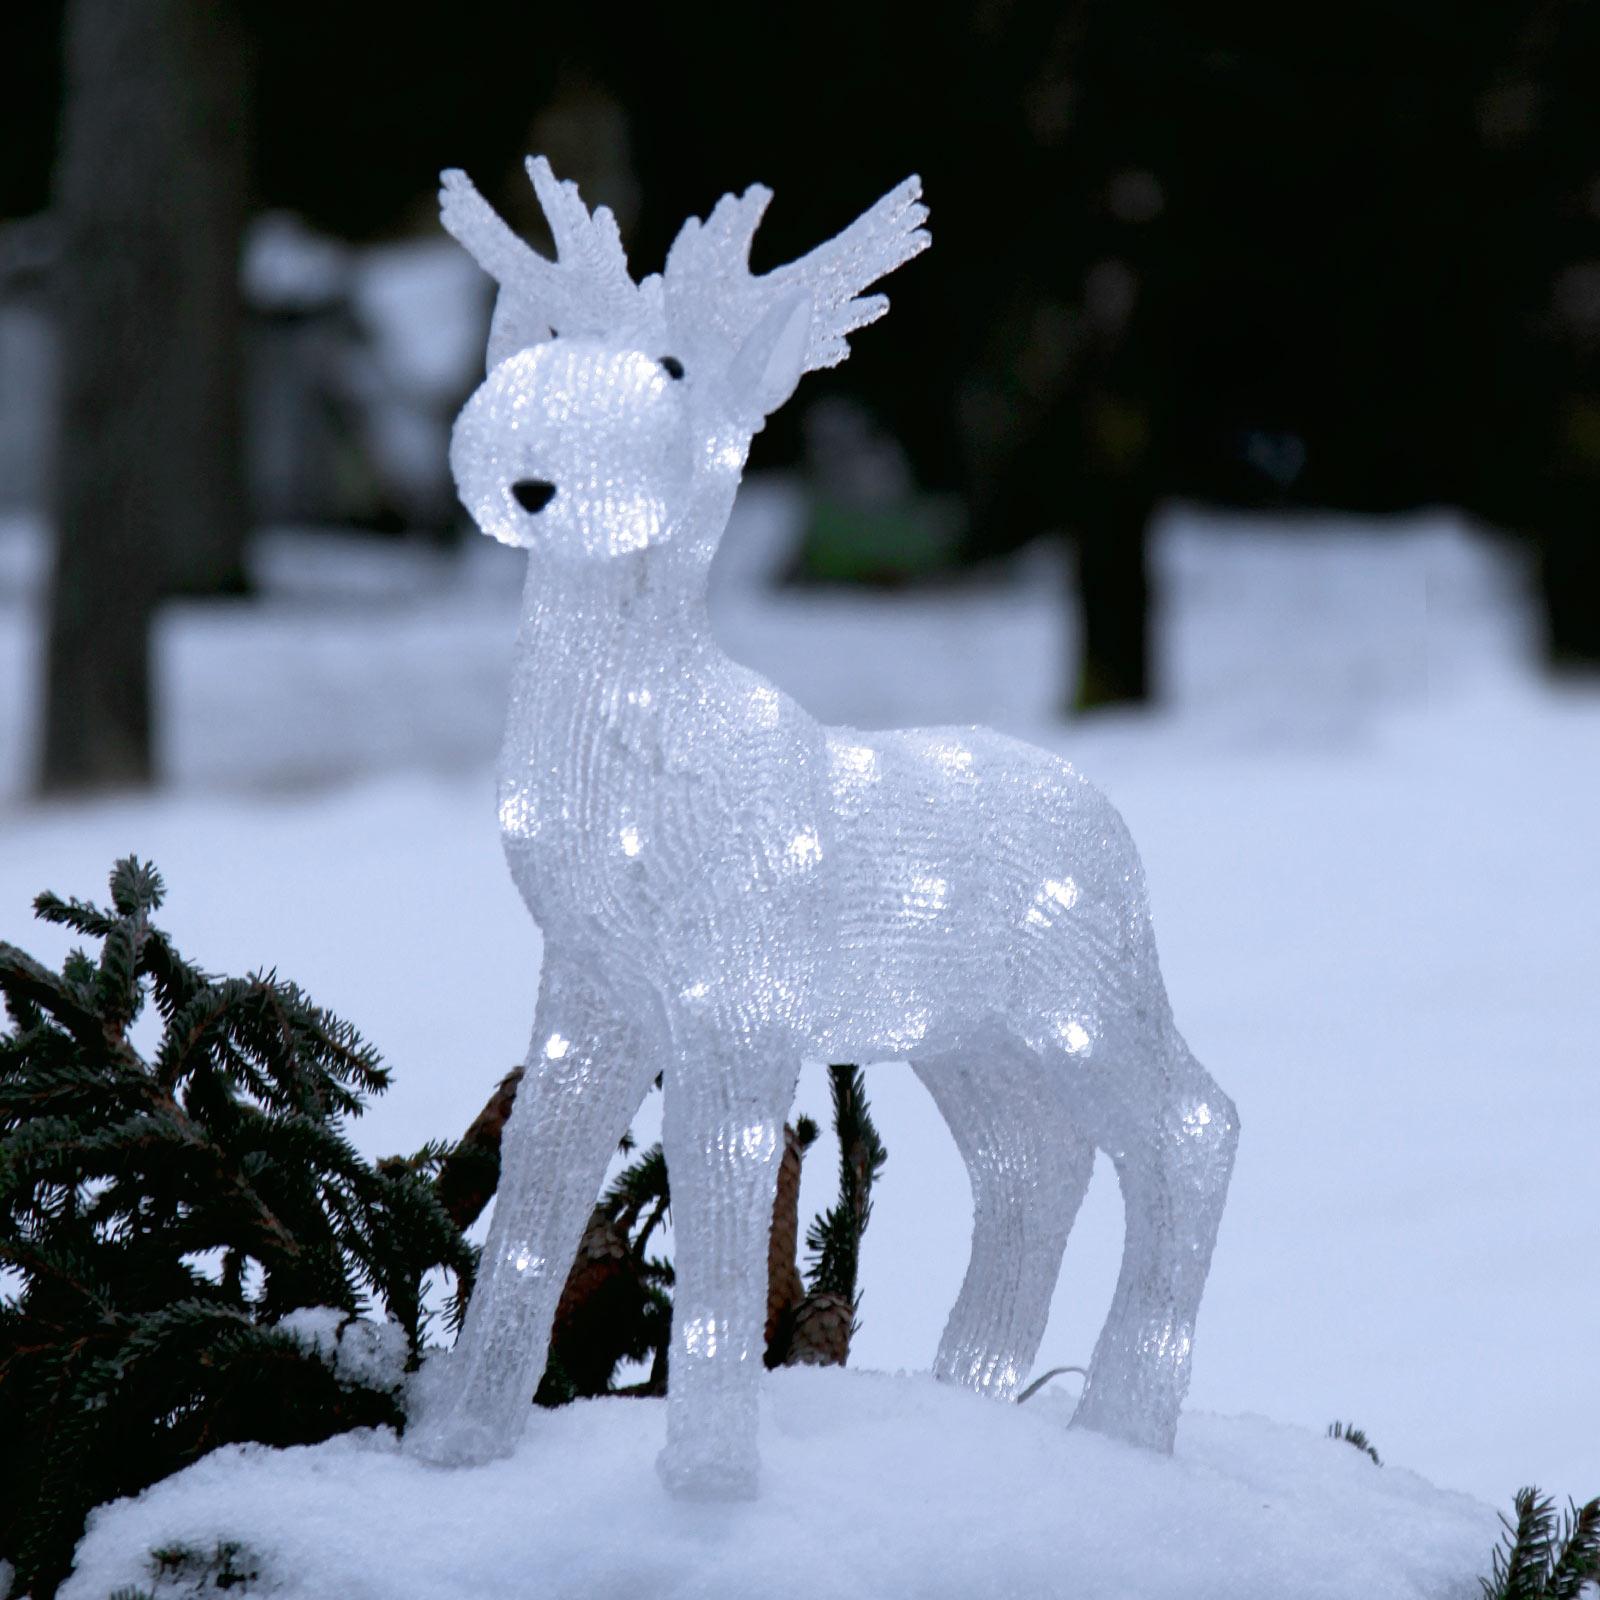 LED-figur Crystalo älg för utomhusbruk